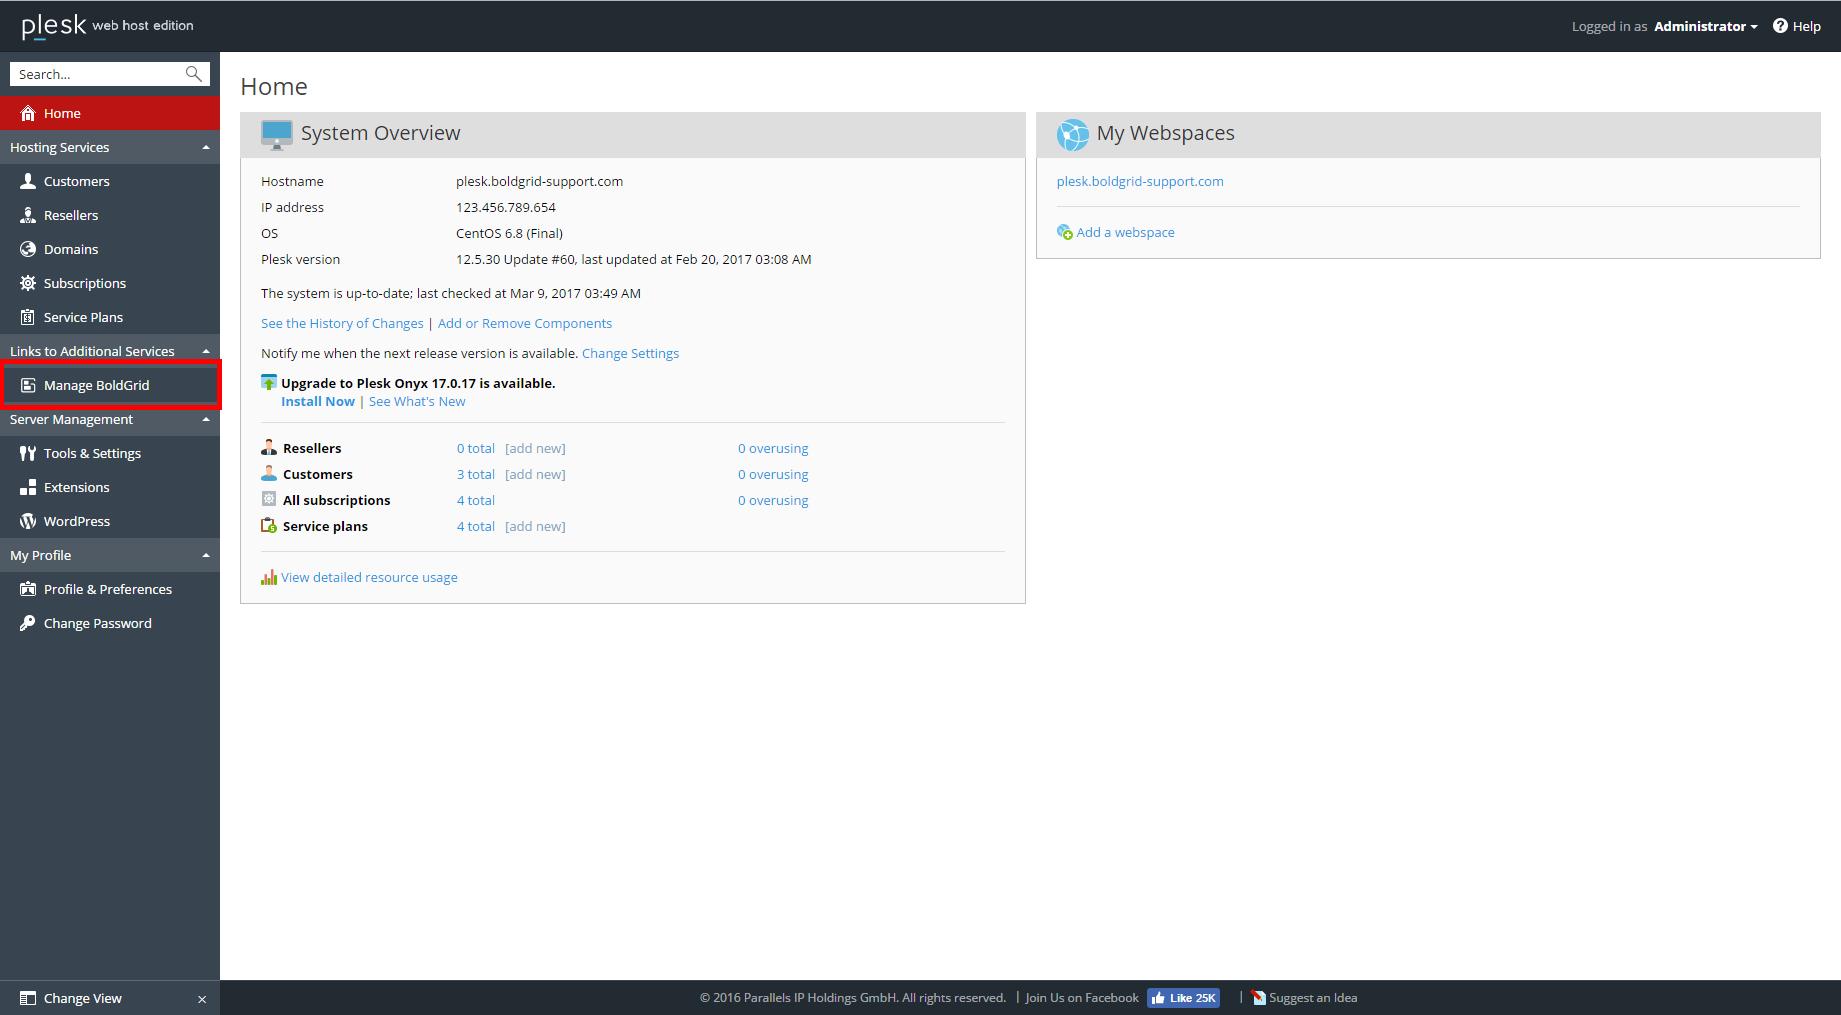 How to Install BoldGrid in Plesk 12.5 Web Host | BoldGrid